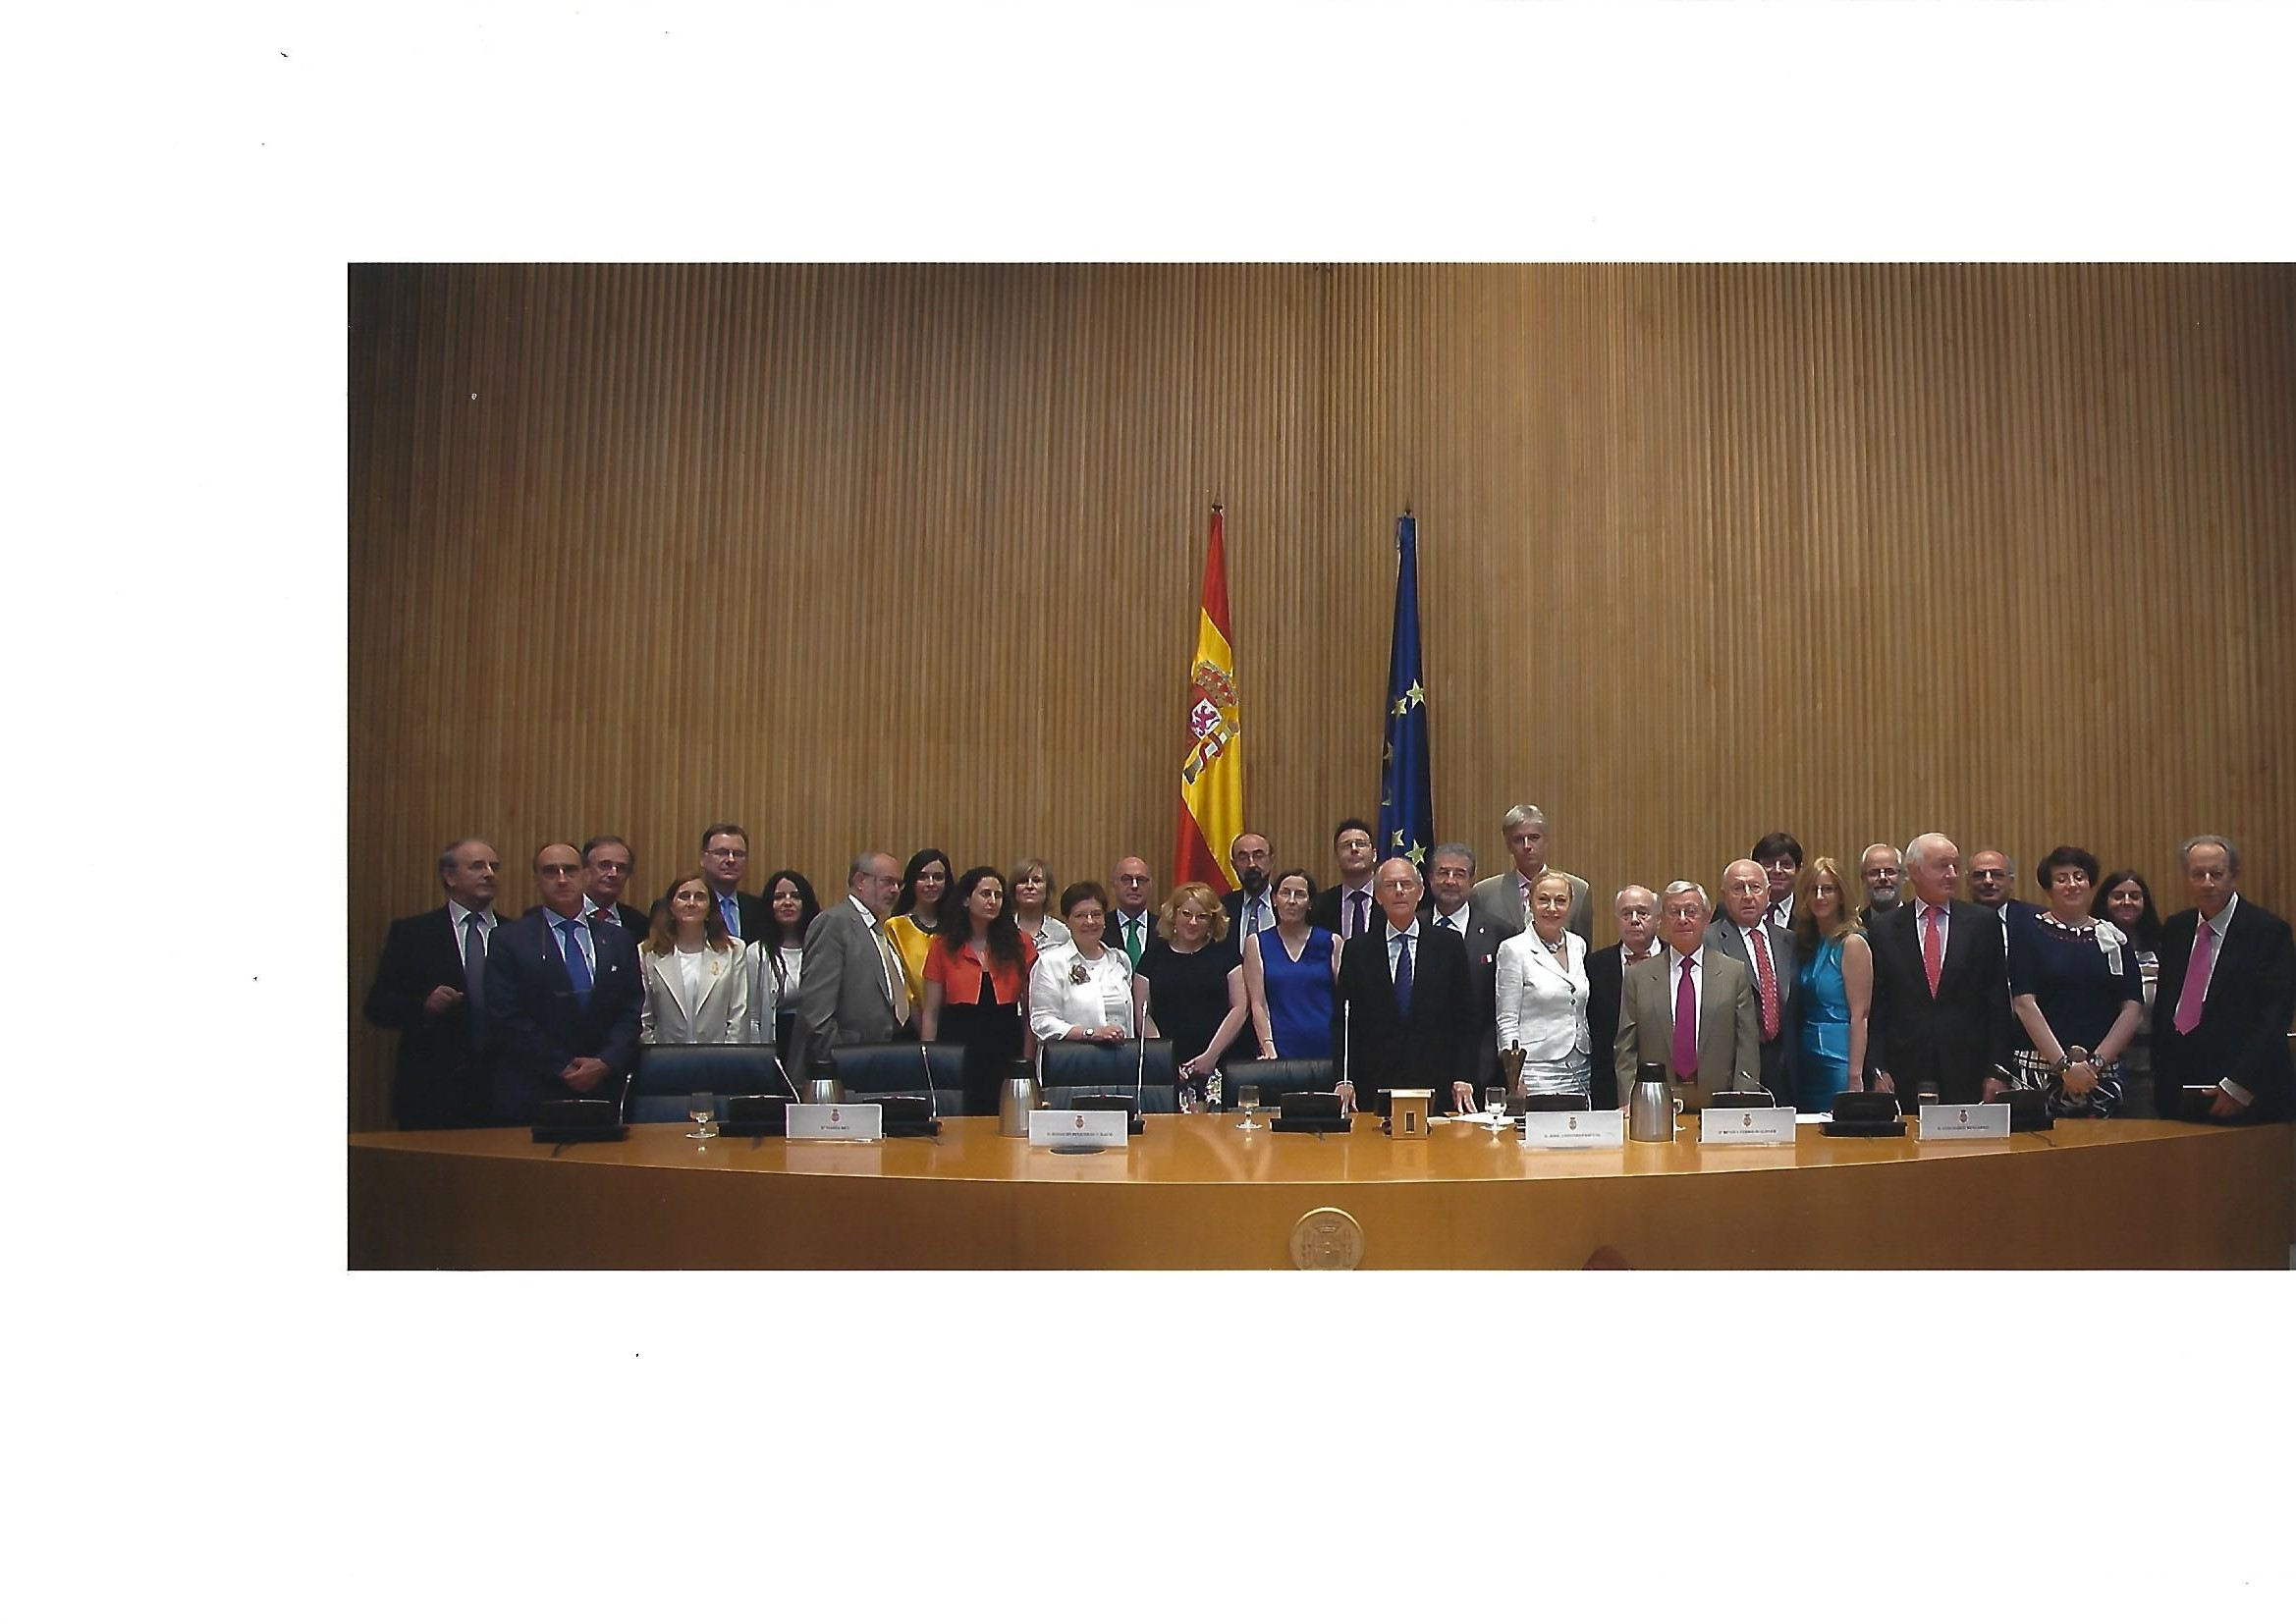 Homenaje universal al idioma español. V aniversario 3